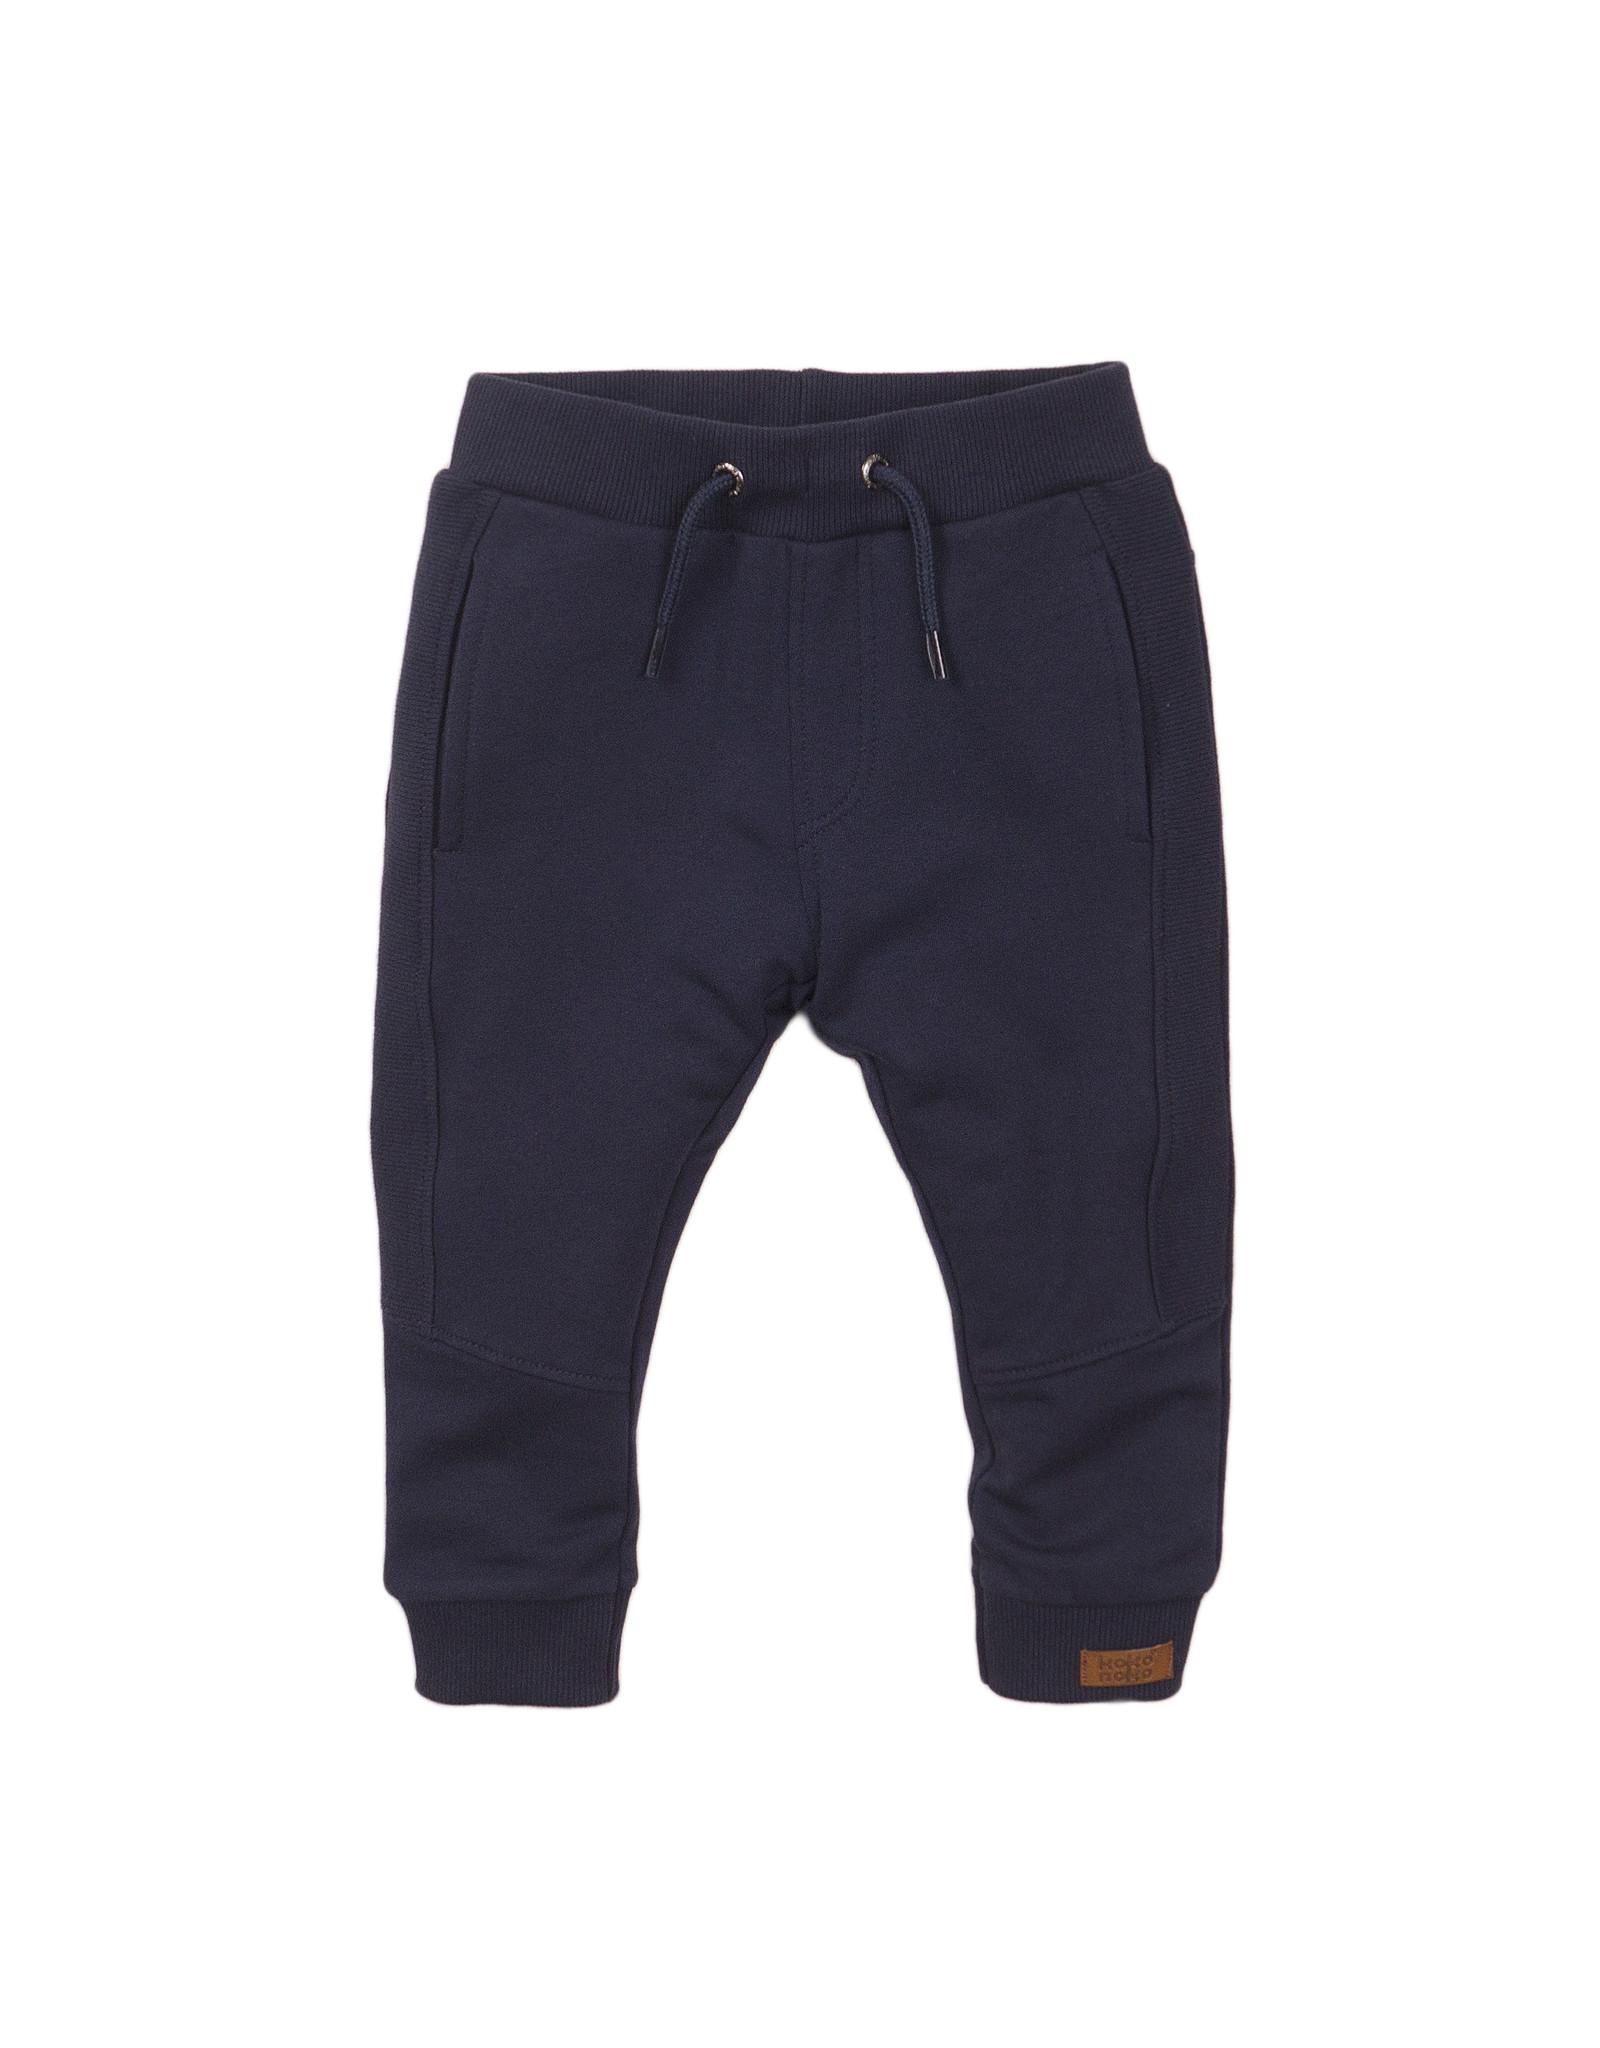 Koko Noko Boys Jogging trousers navy1